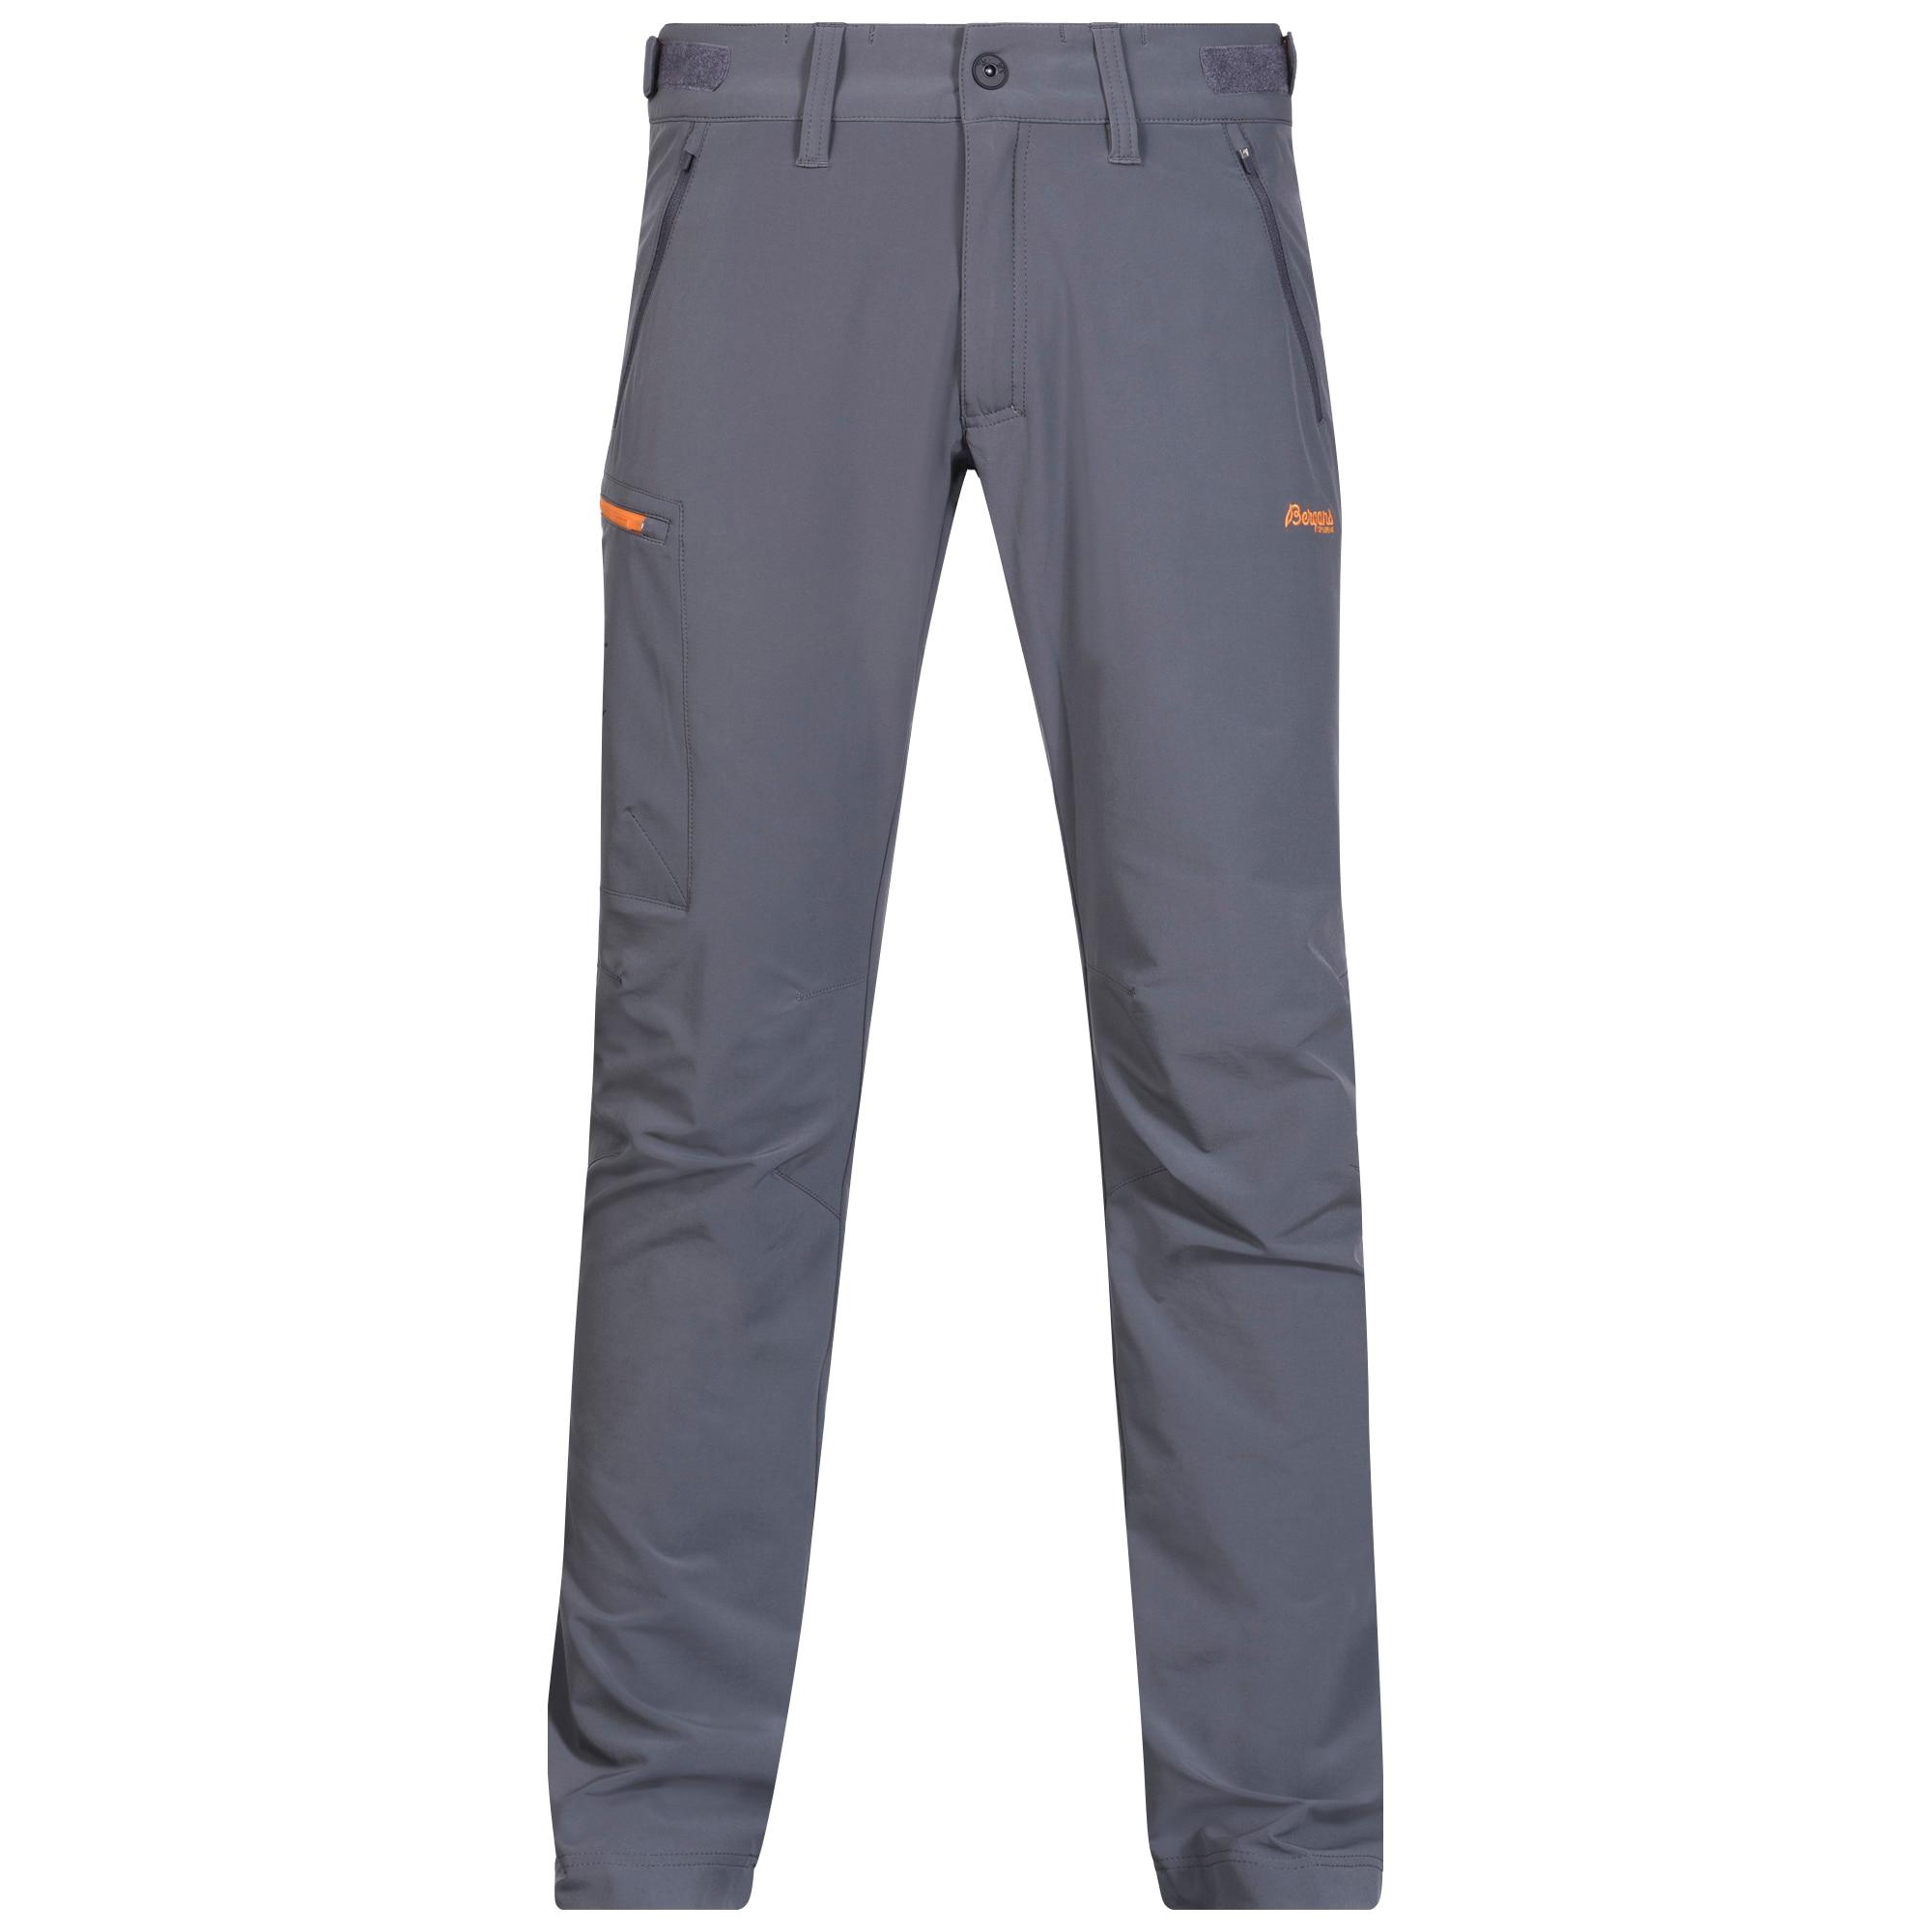 Torfinnstind Pants